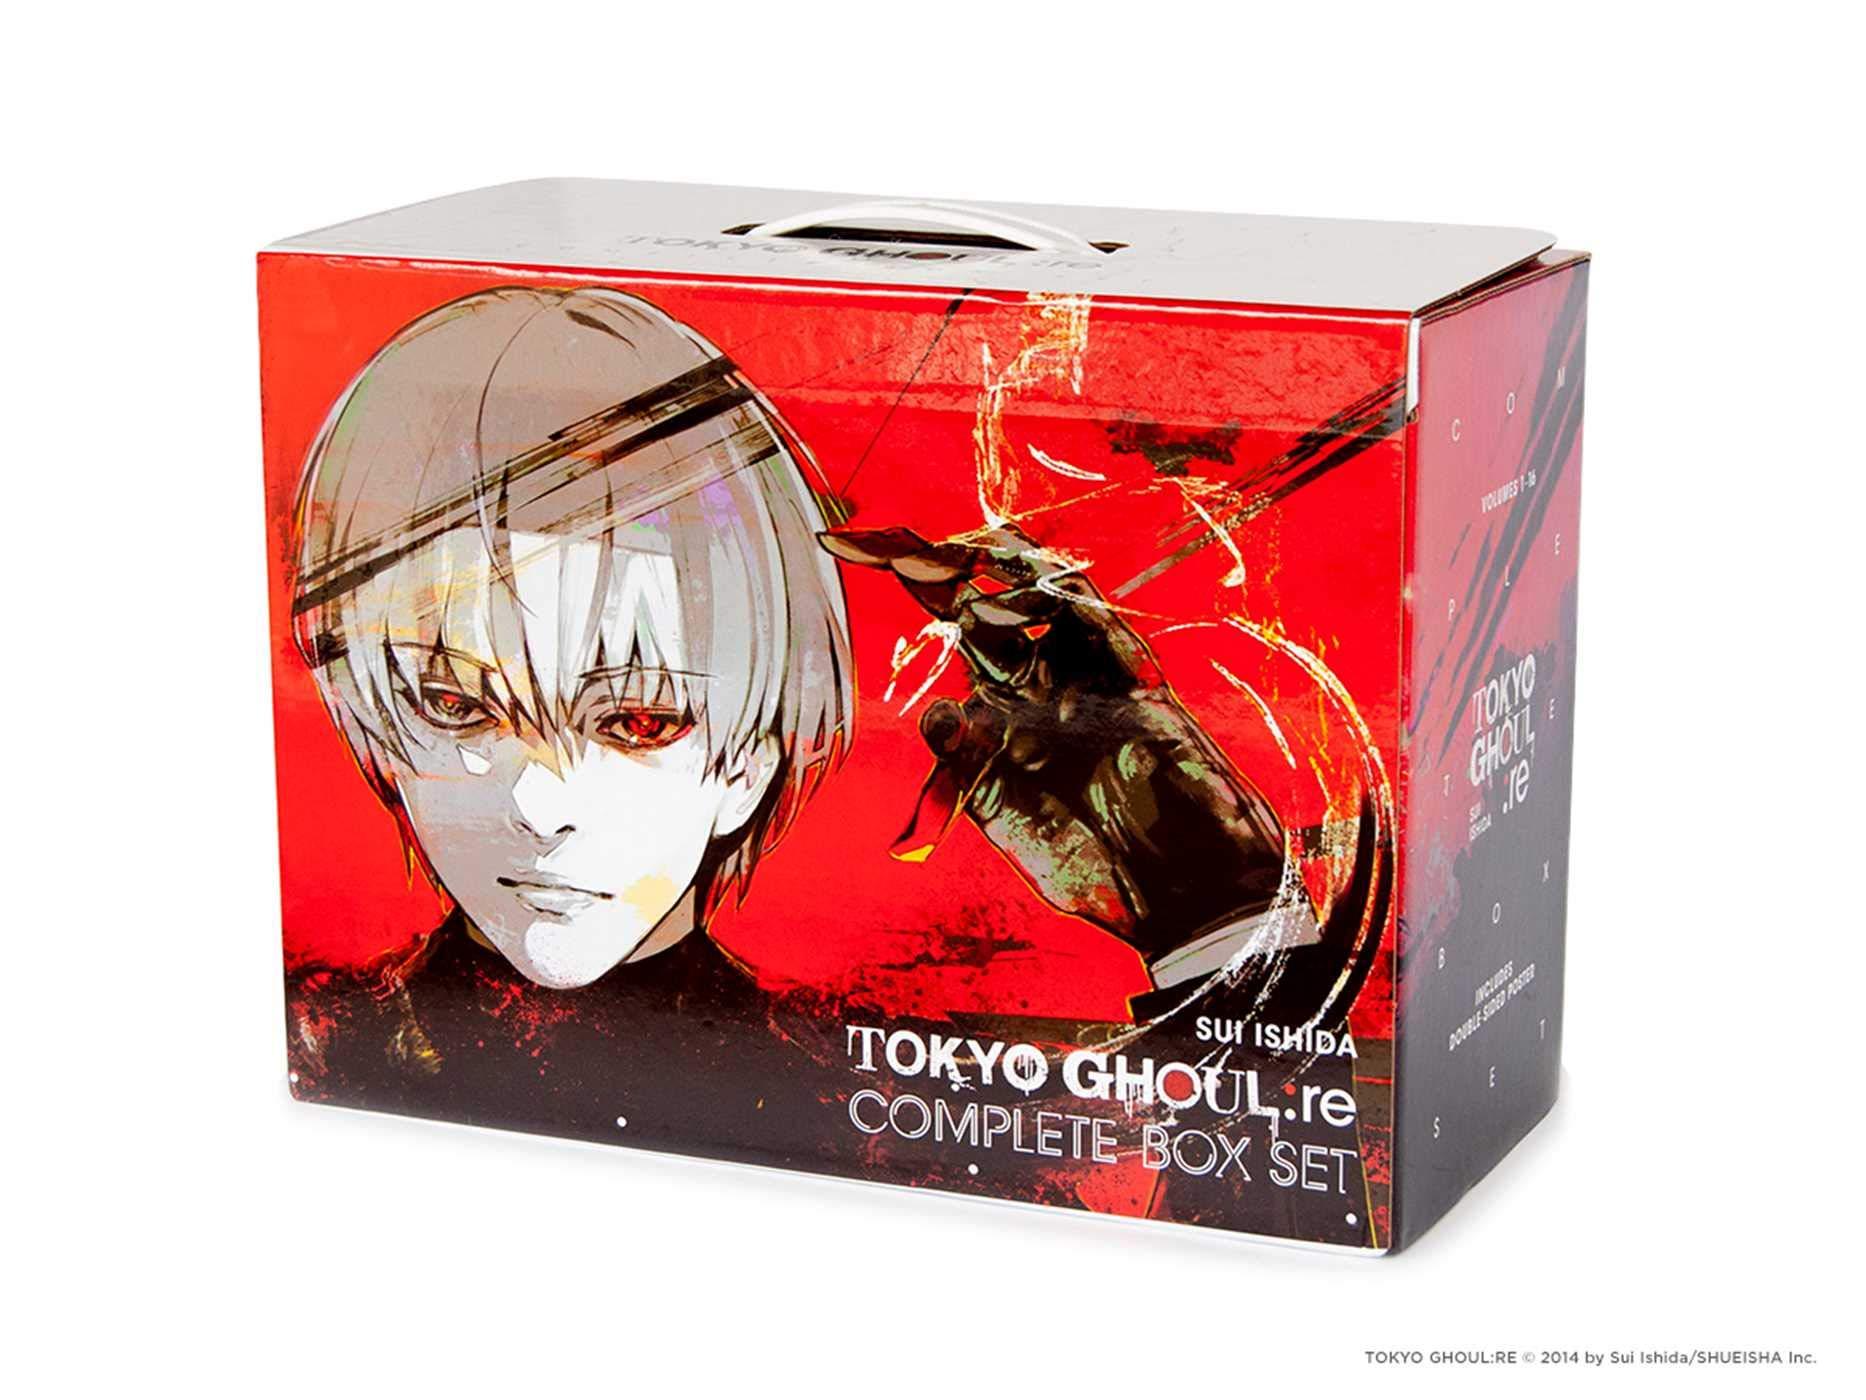 Poster Brand New Graphic Novel Tokyo Ghoul Re Manga Box Set 1-16